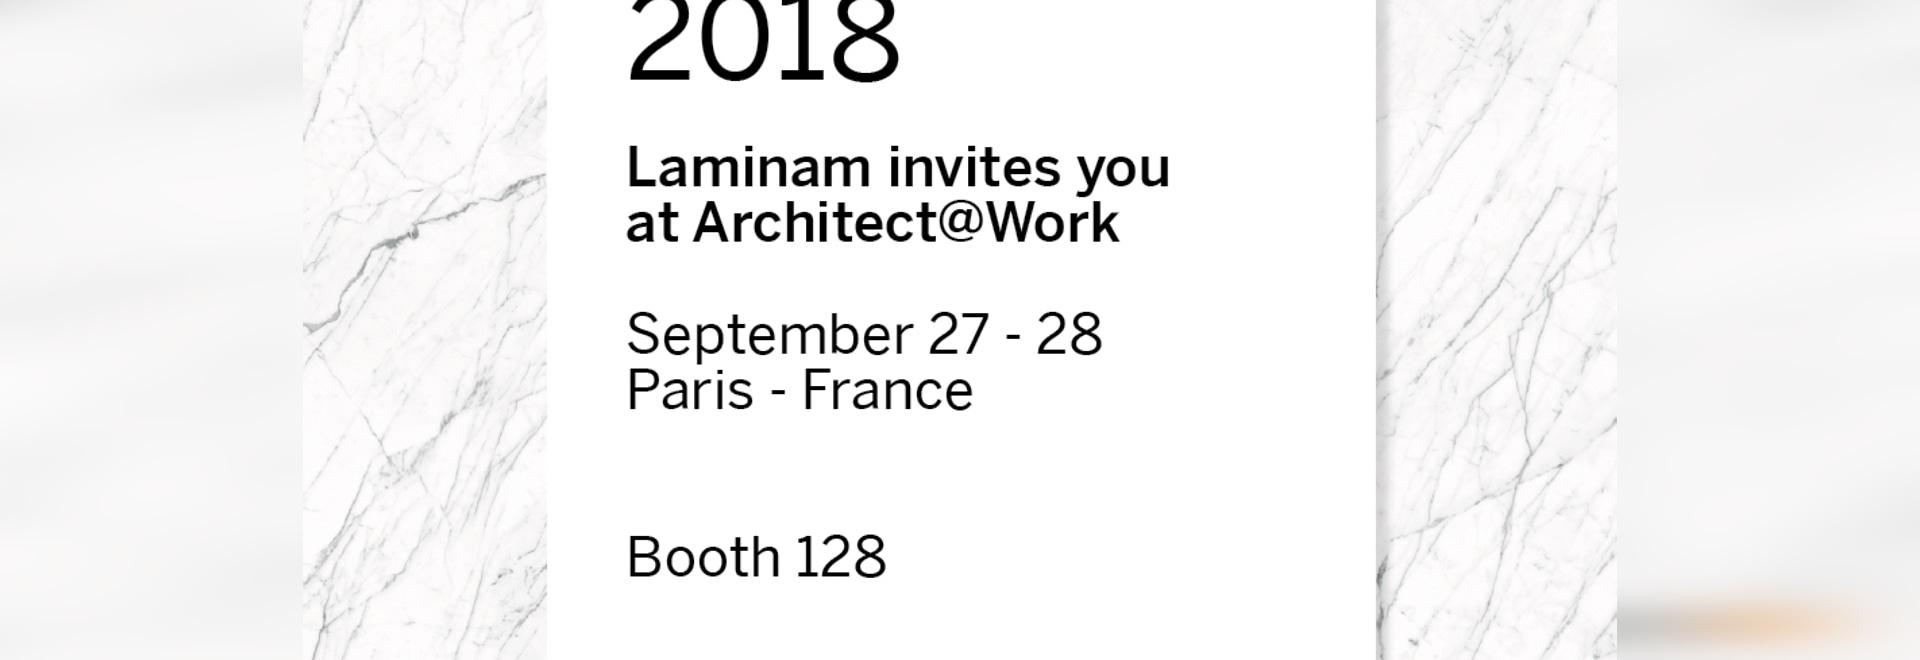 LAMINAM-INNOVATION AUF STADIUM BEI ARCHITECT@WORK PARIS